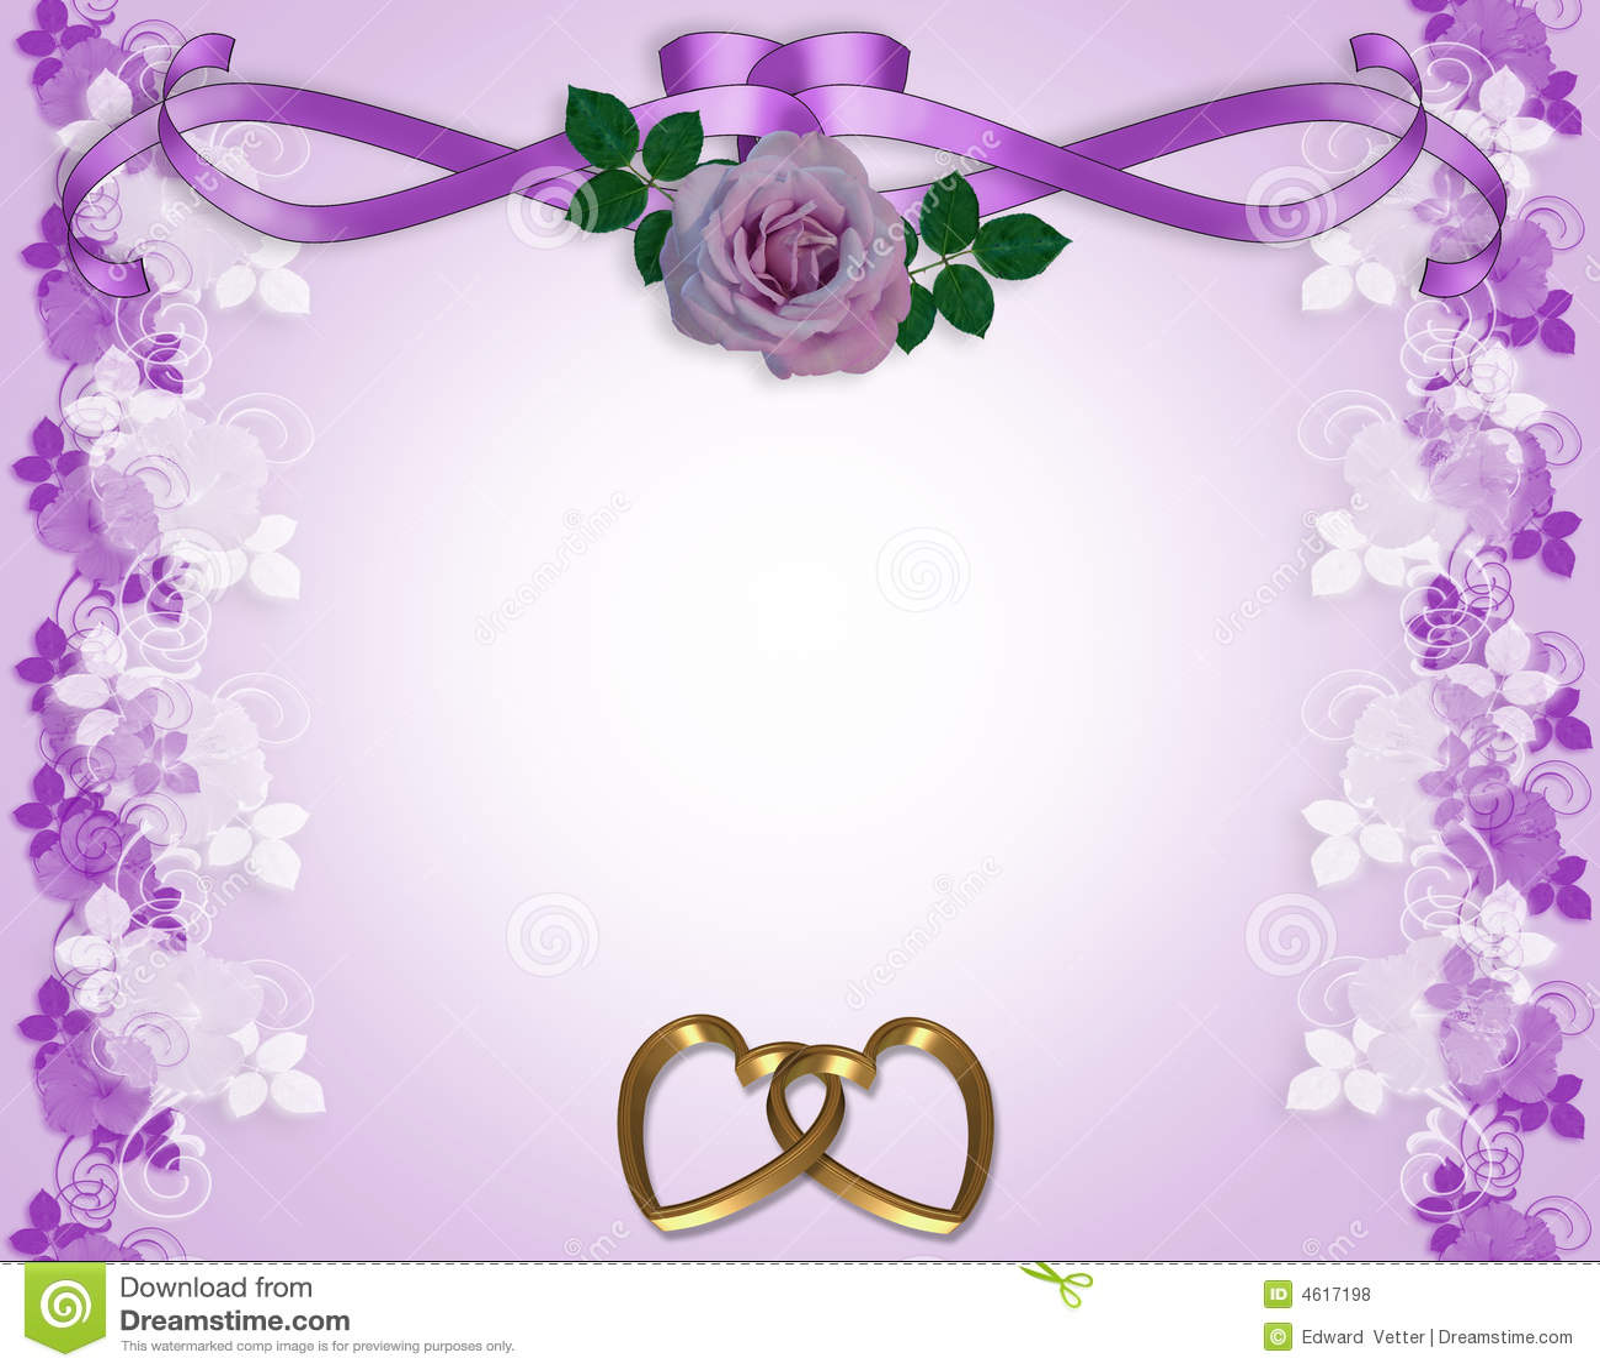 Lavender Background Wedding: Lavender Rose Wedding Invitation Royalty Free Stock Photos